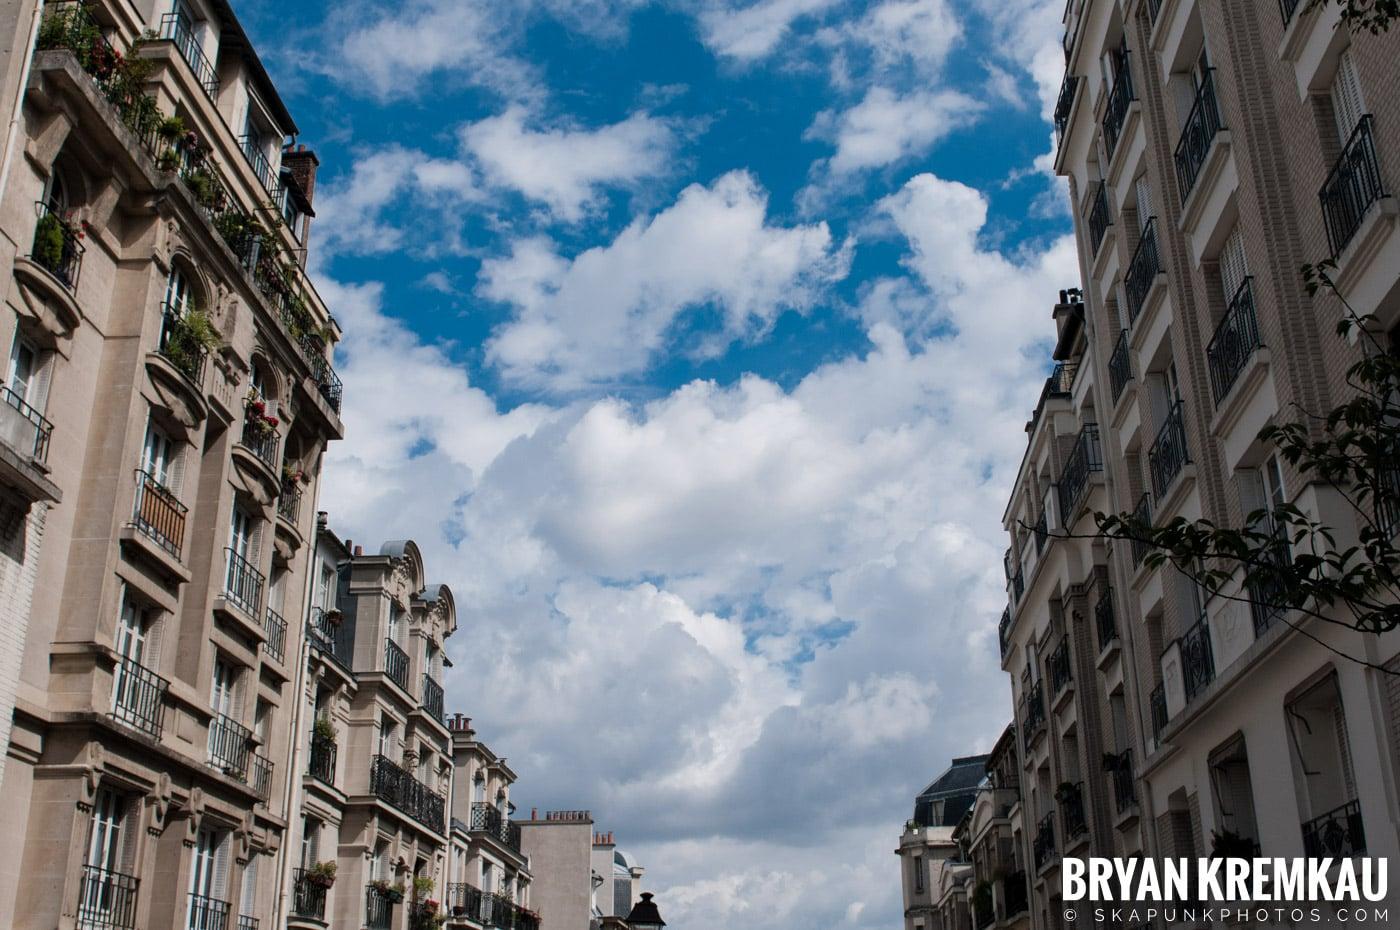 Paris, France Honeymoon - Day 6 - 7.23.11 (34)